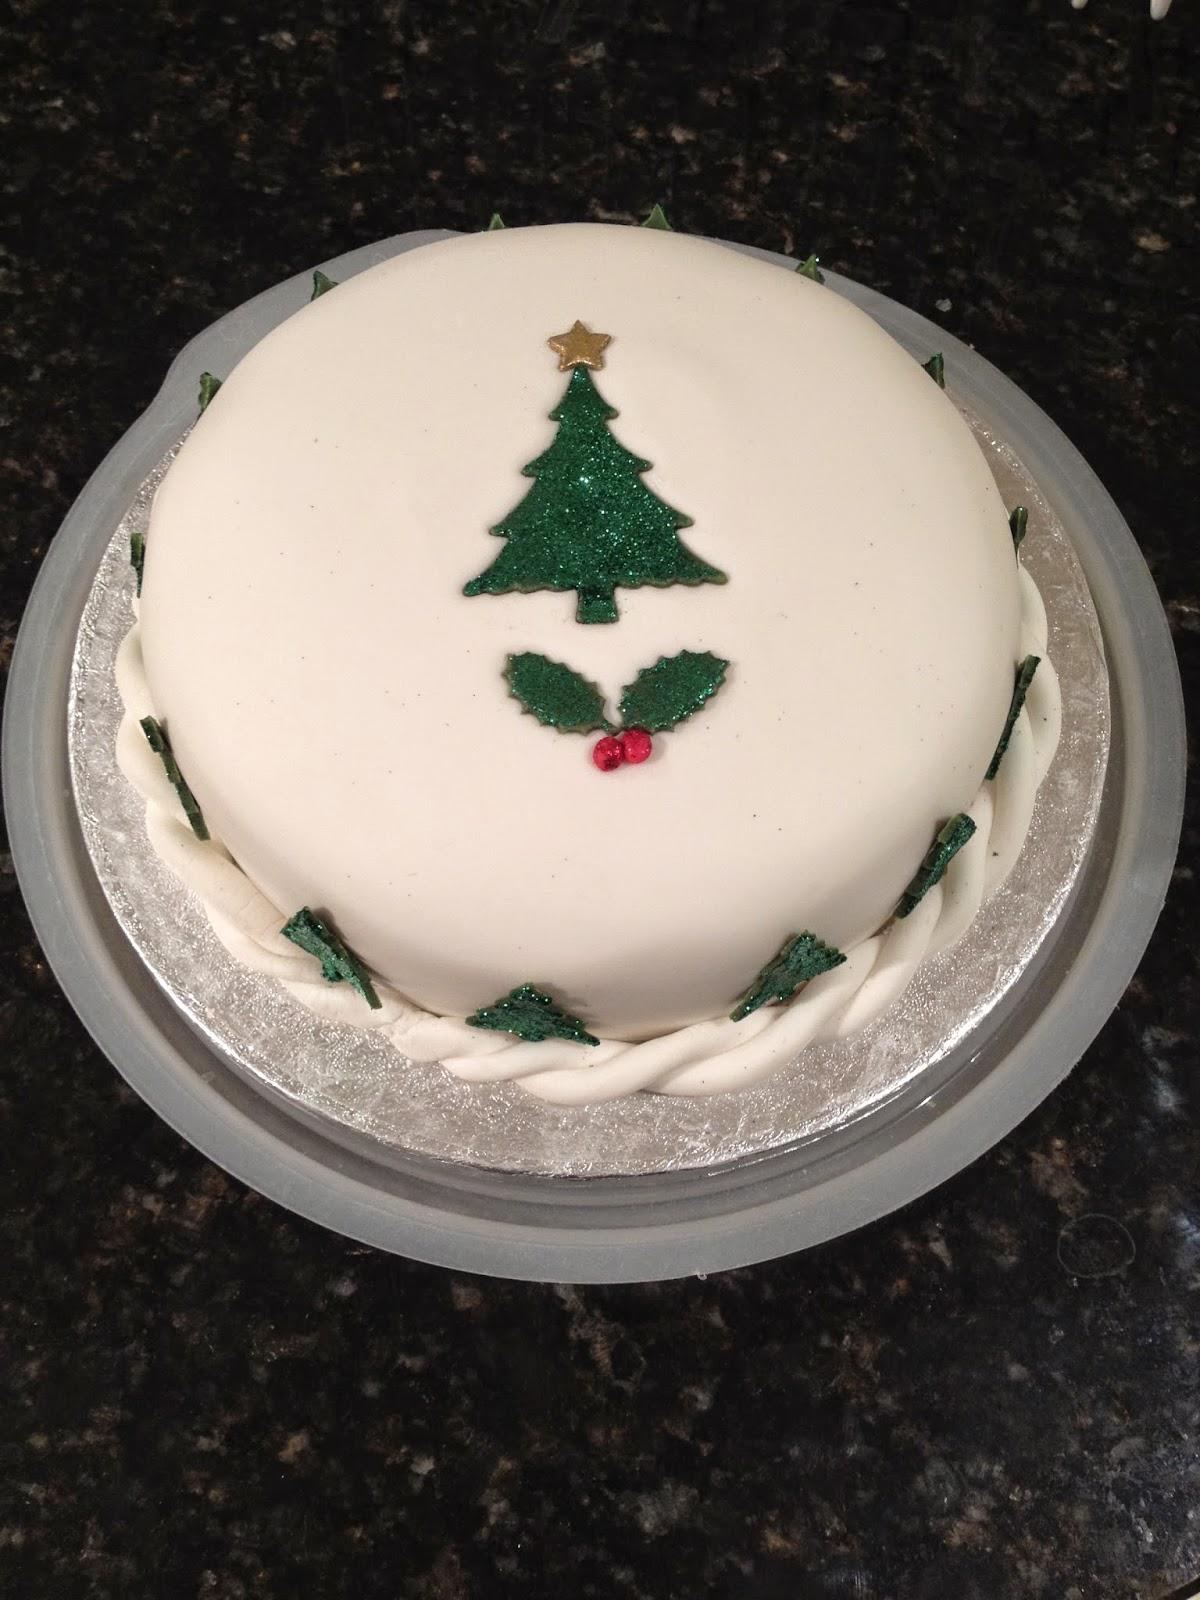 Delia Smith Christmas Cake Recipe Scaling Up